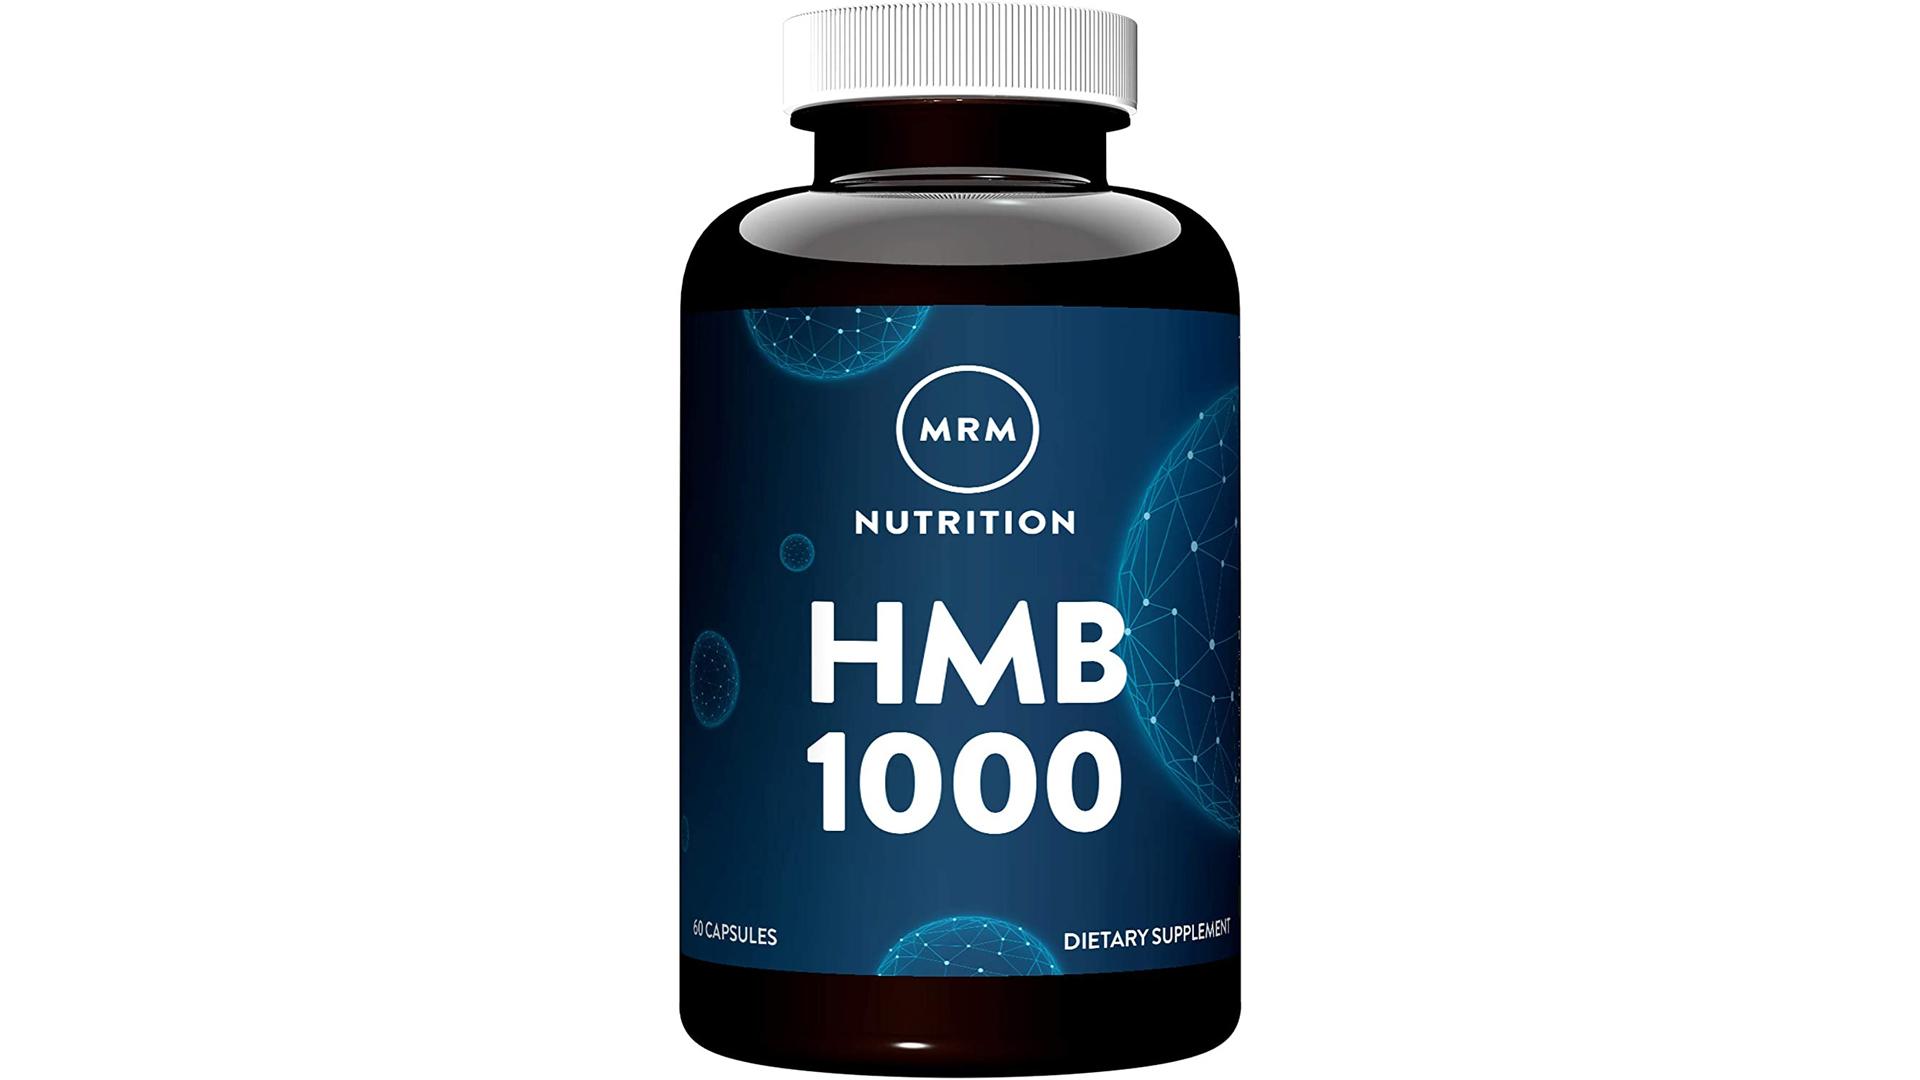 MRM, HMB 1000